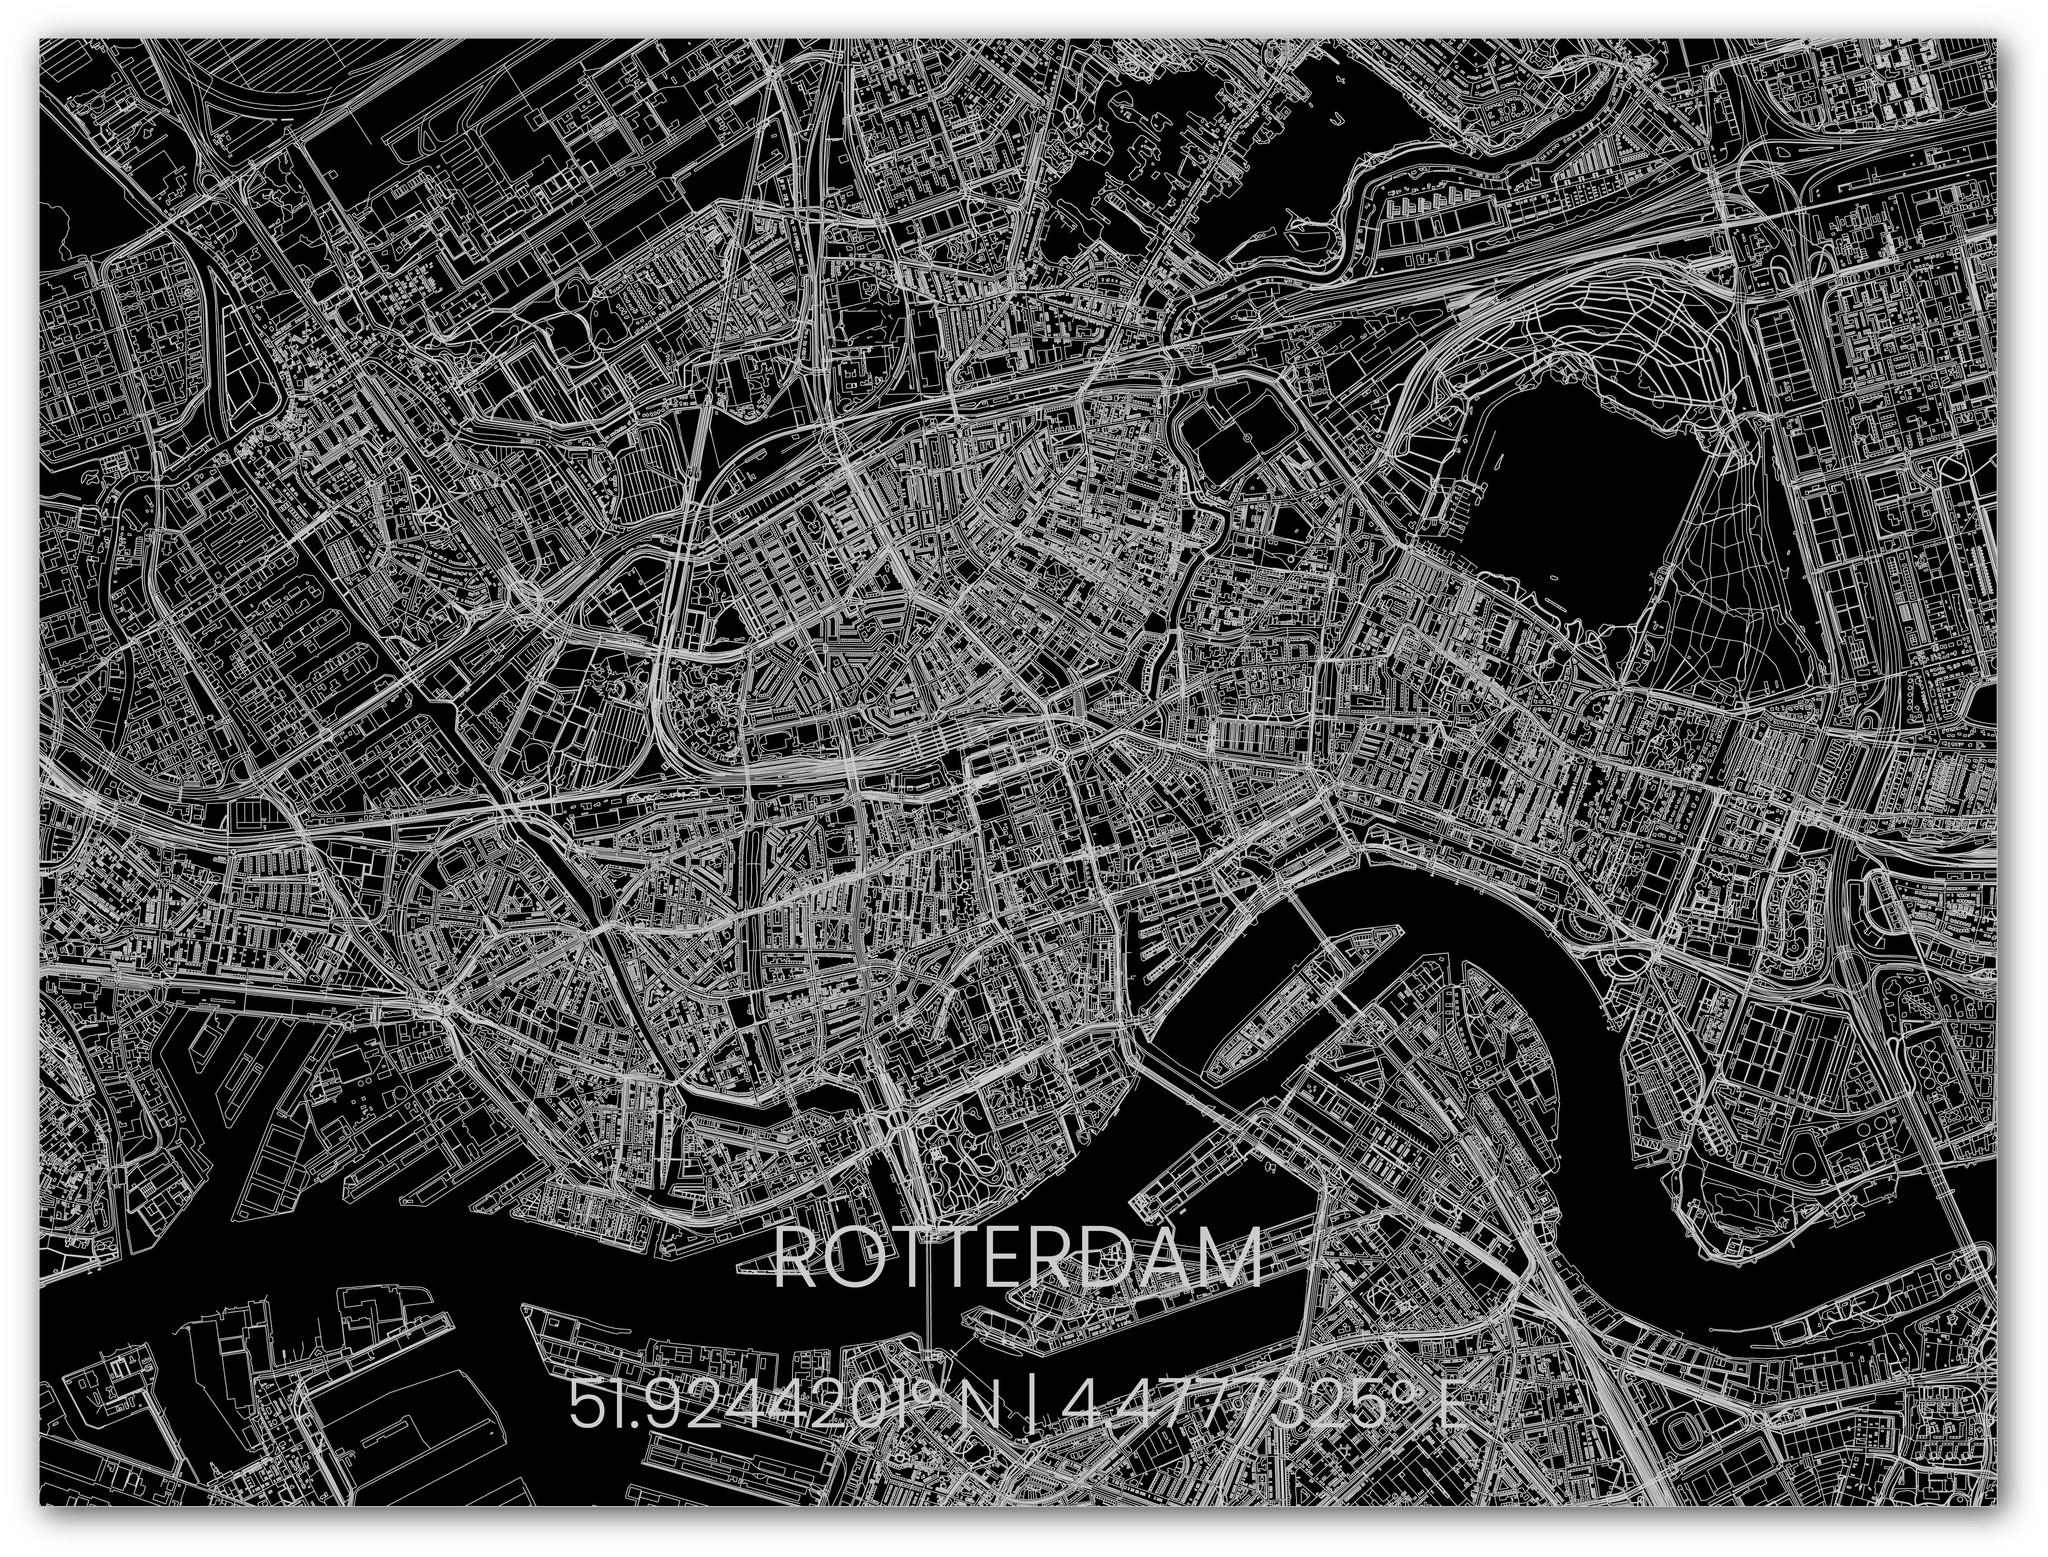 Metalen stadsplattegrond Rotterdam-2